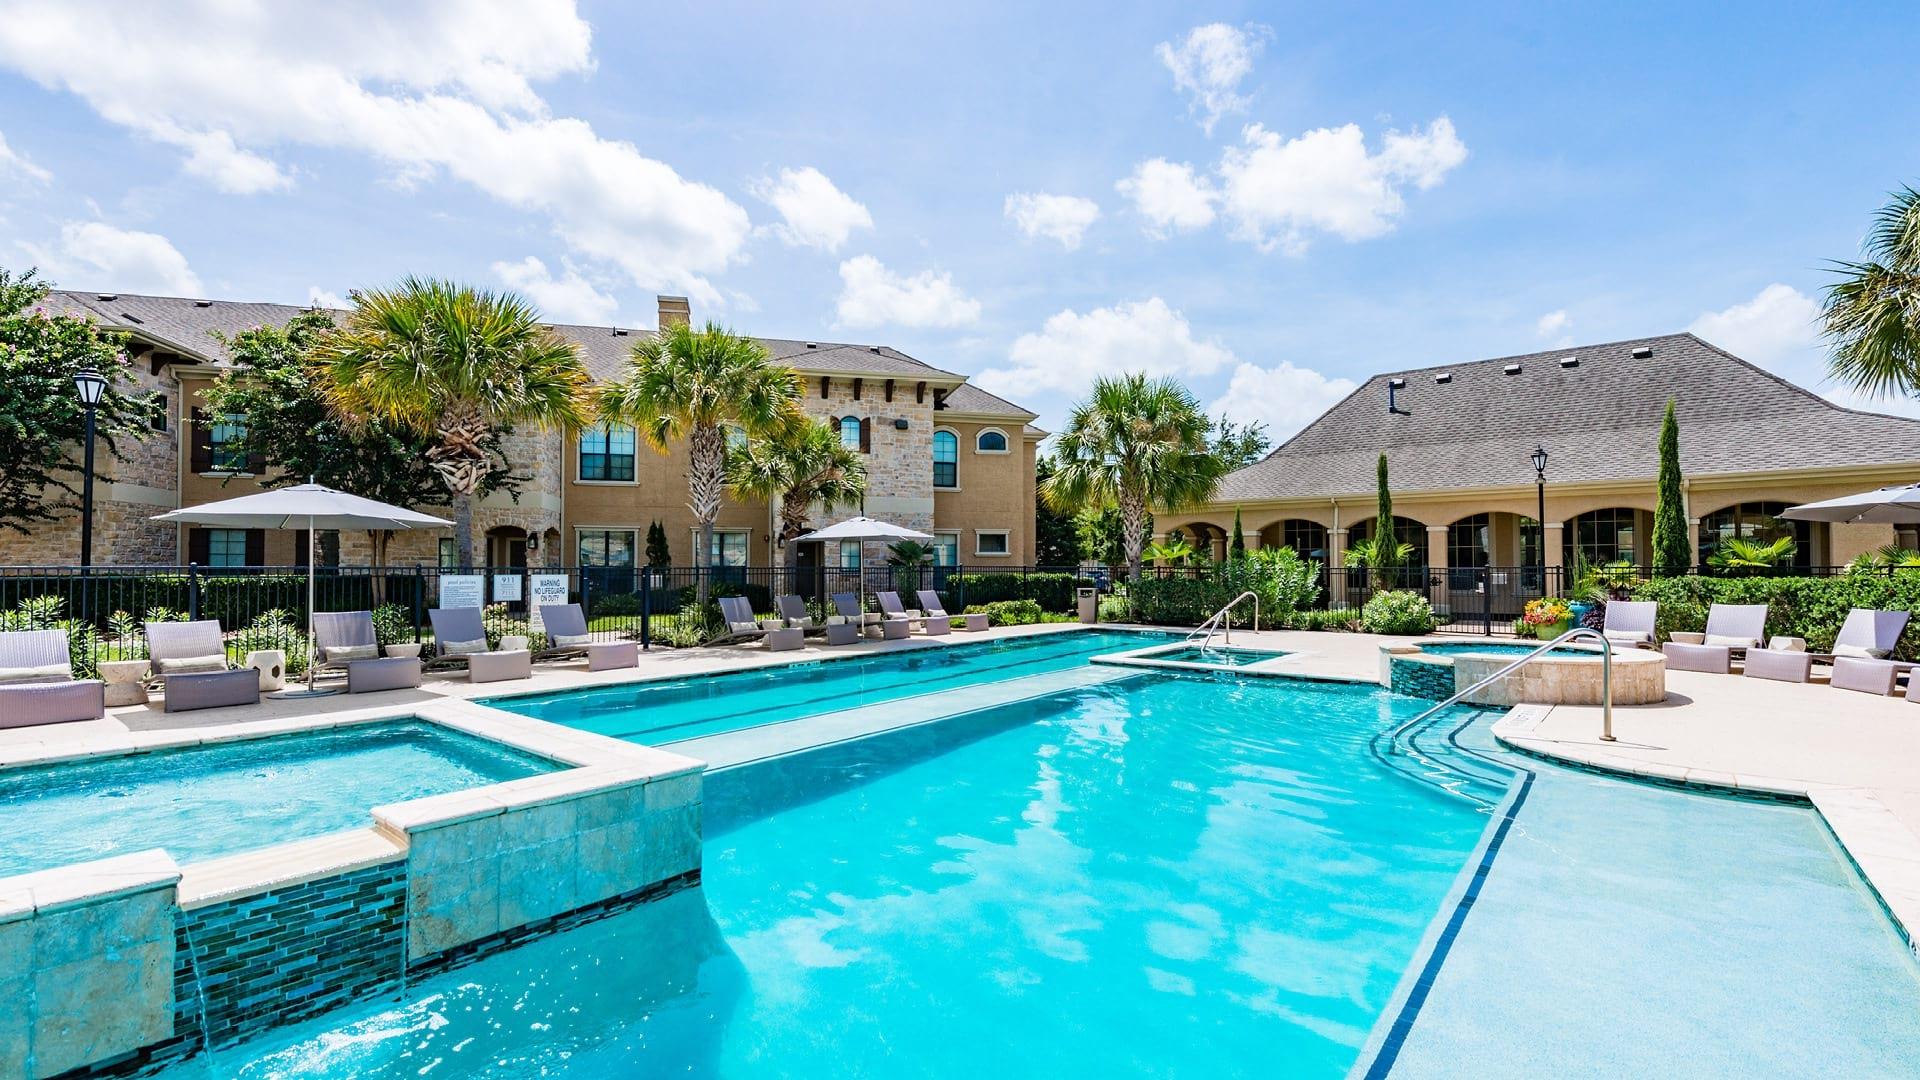 Apartment pool at apartments in Richmond TX